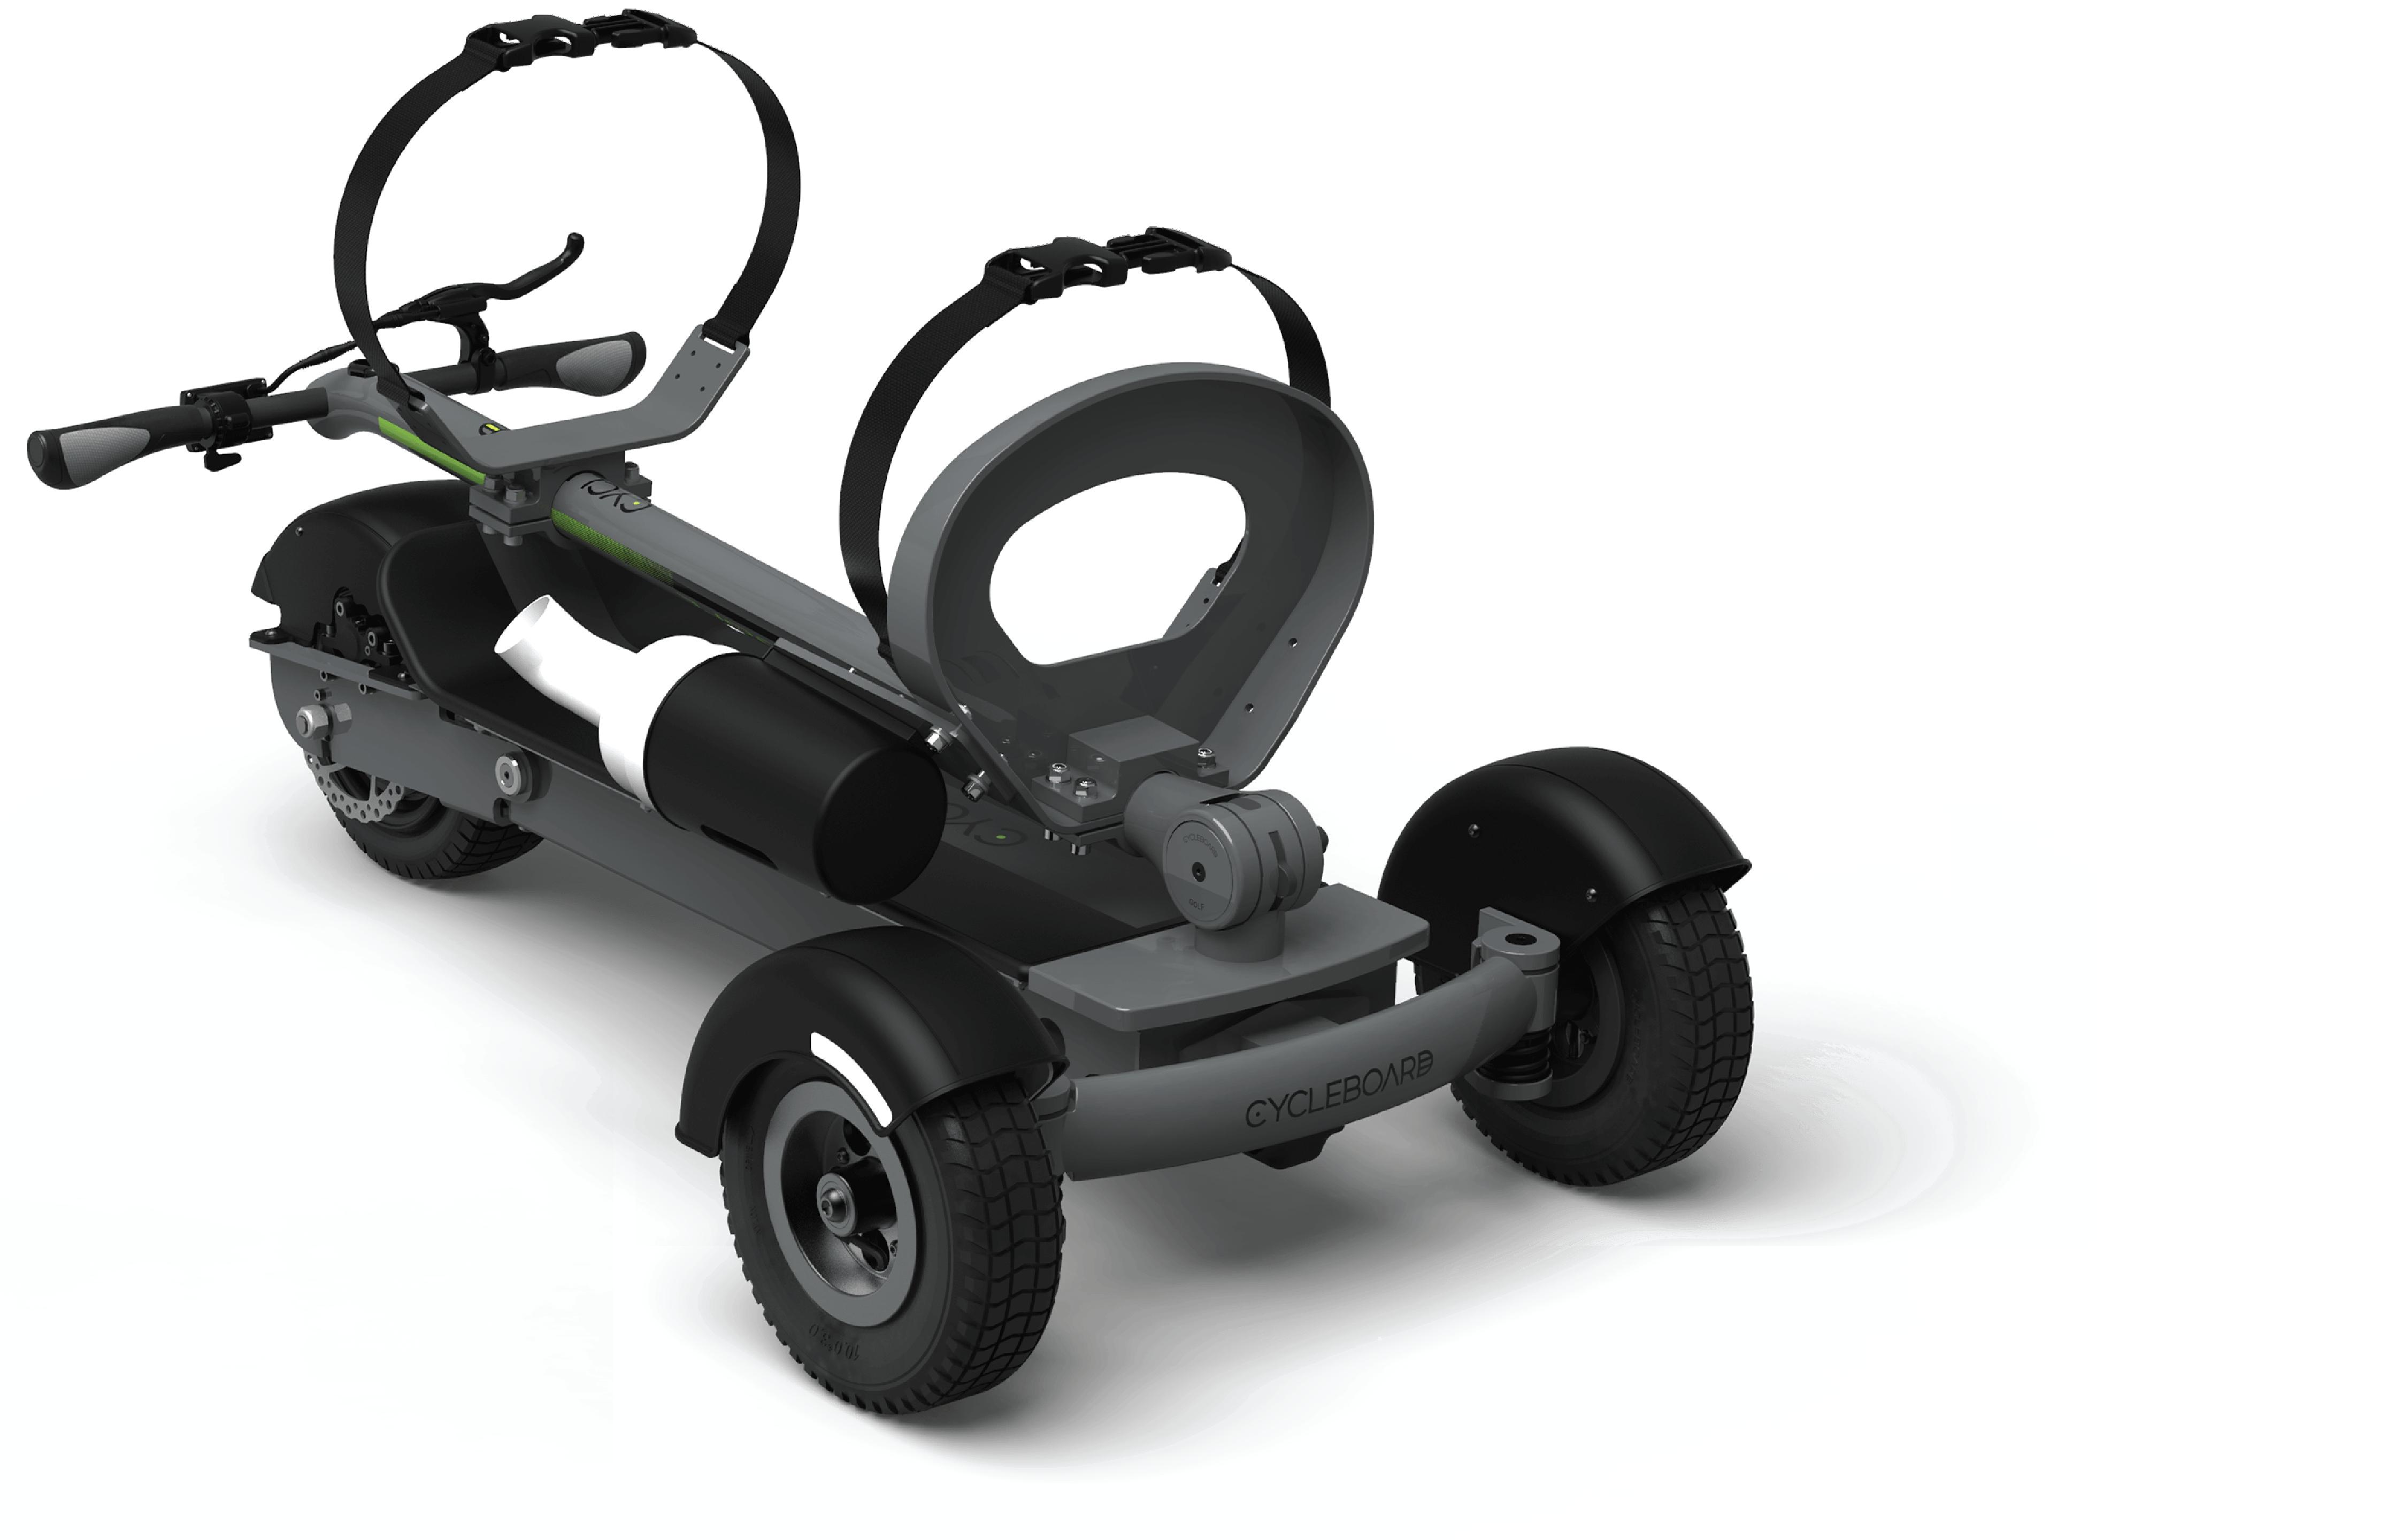 CycleBoard Golf Vehicle